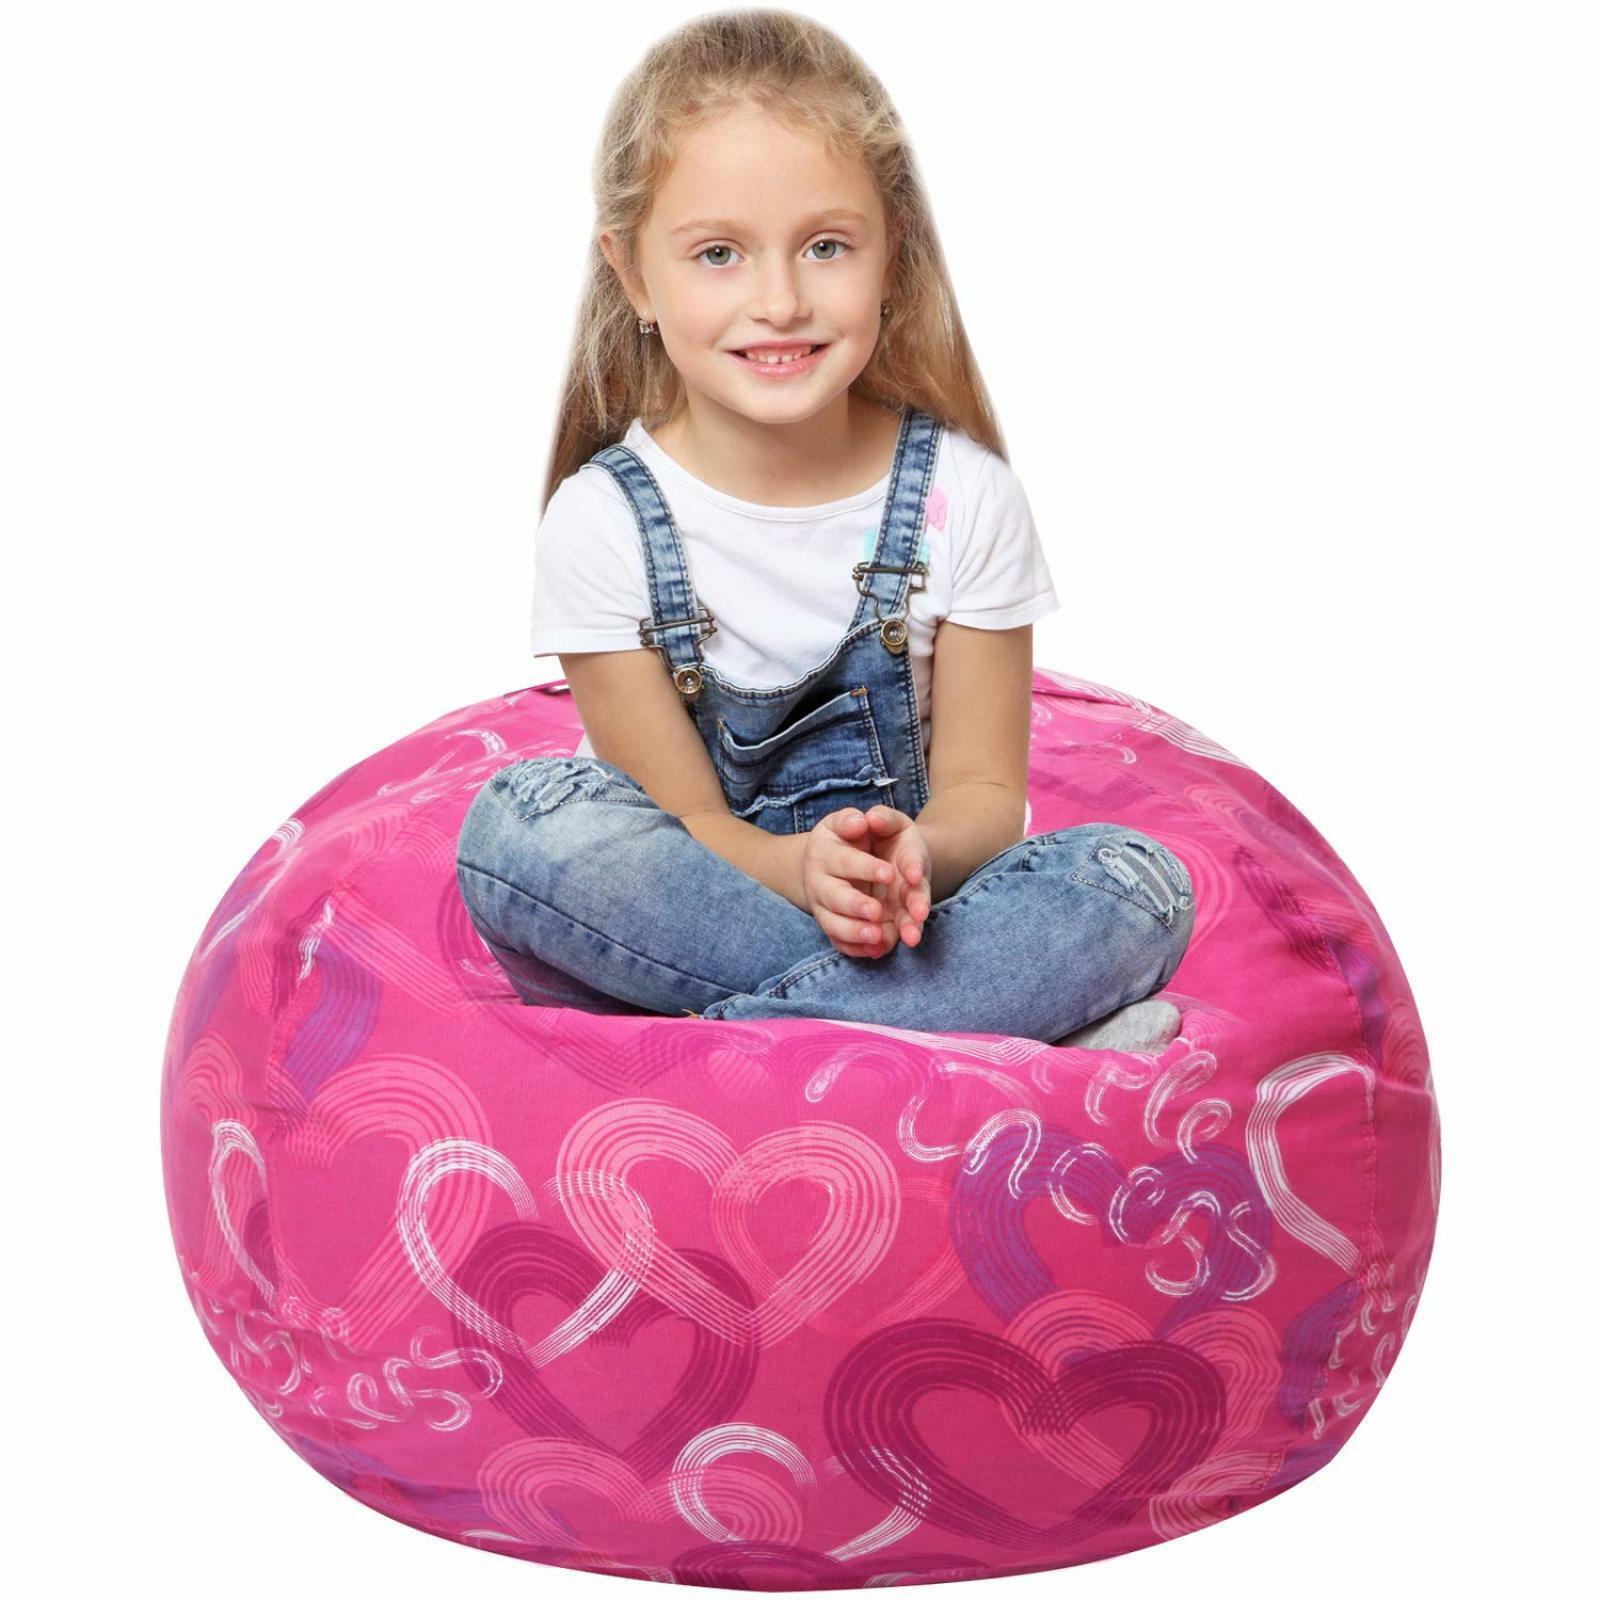 Beau Stuffed Animal Storage Bean Bag Chairs Kids Girls Plush Toys Holder  Organizer